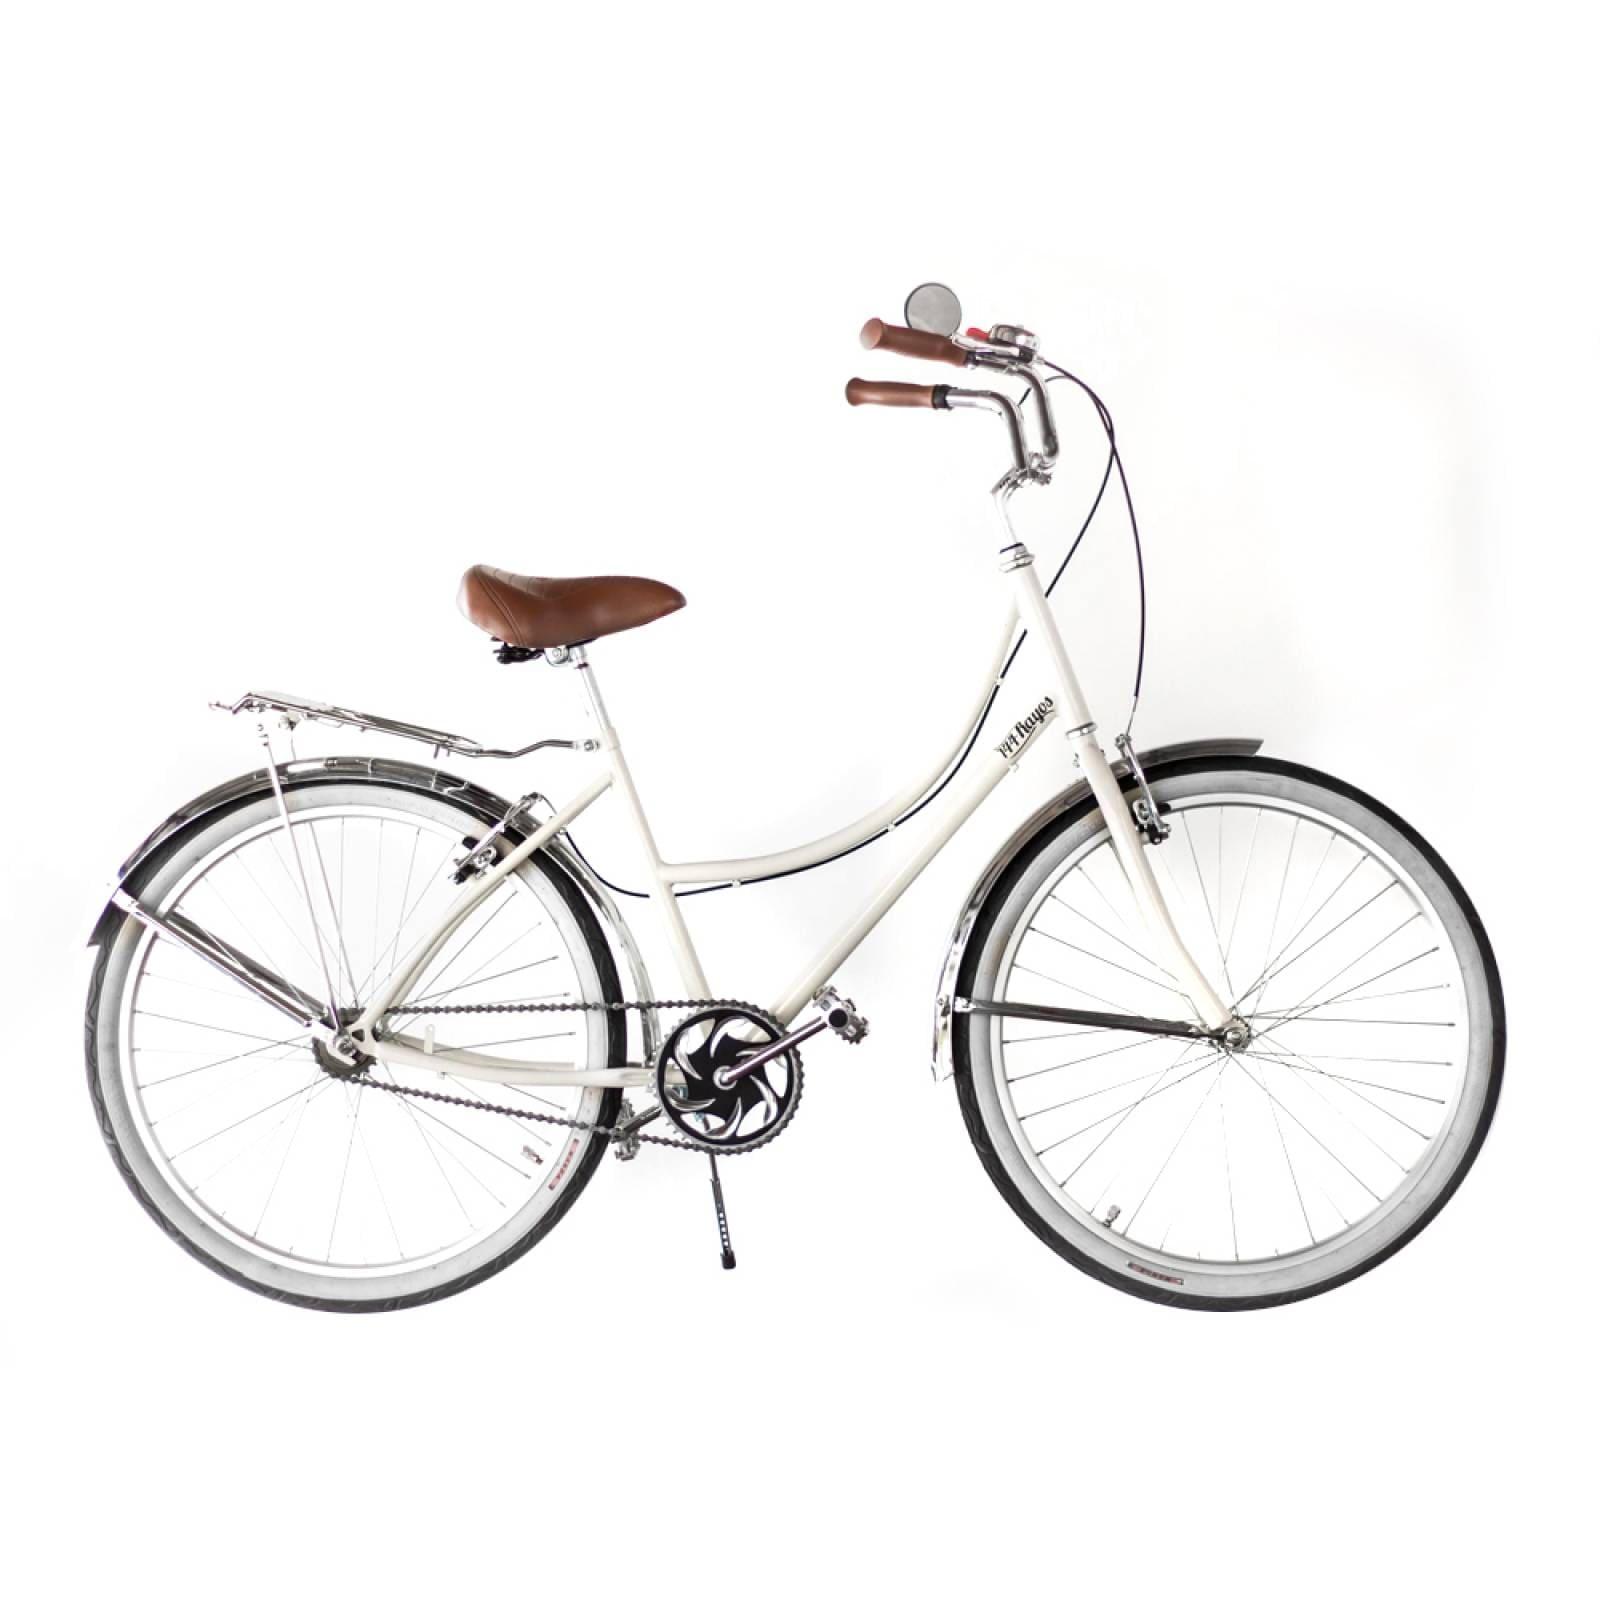 Bici Inglesa36 Rodada 26 Acero Asiento Vinil Pedales Aluminio 144 Rayos Bikes